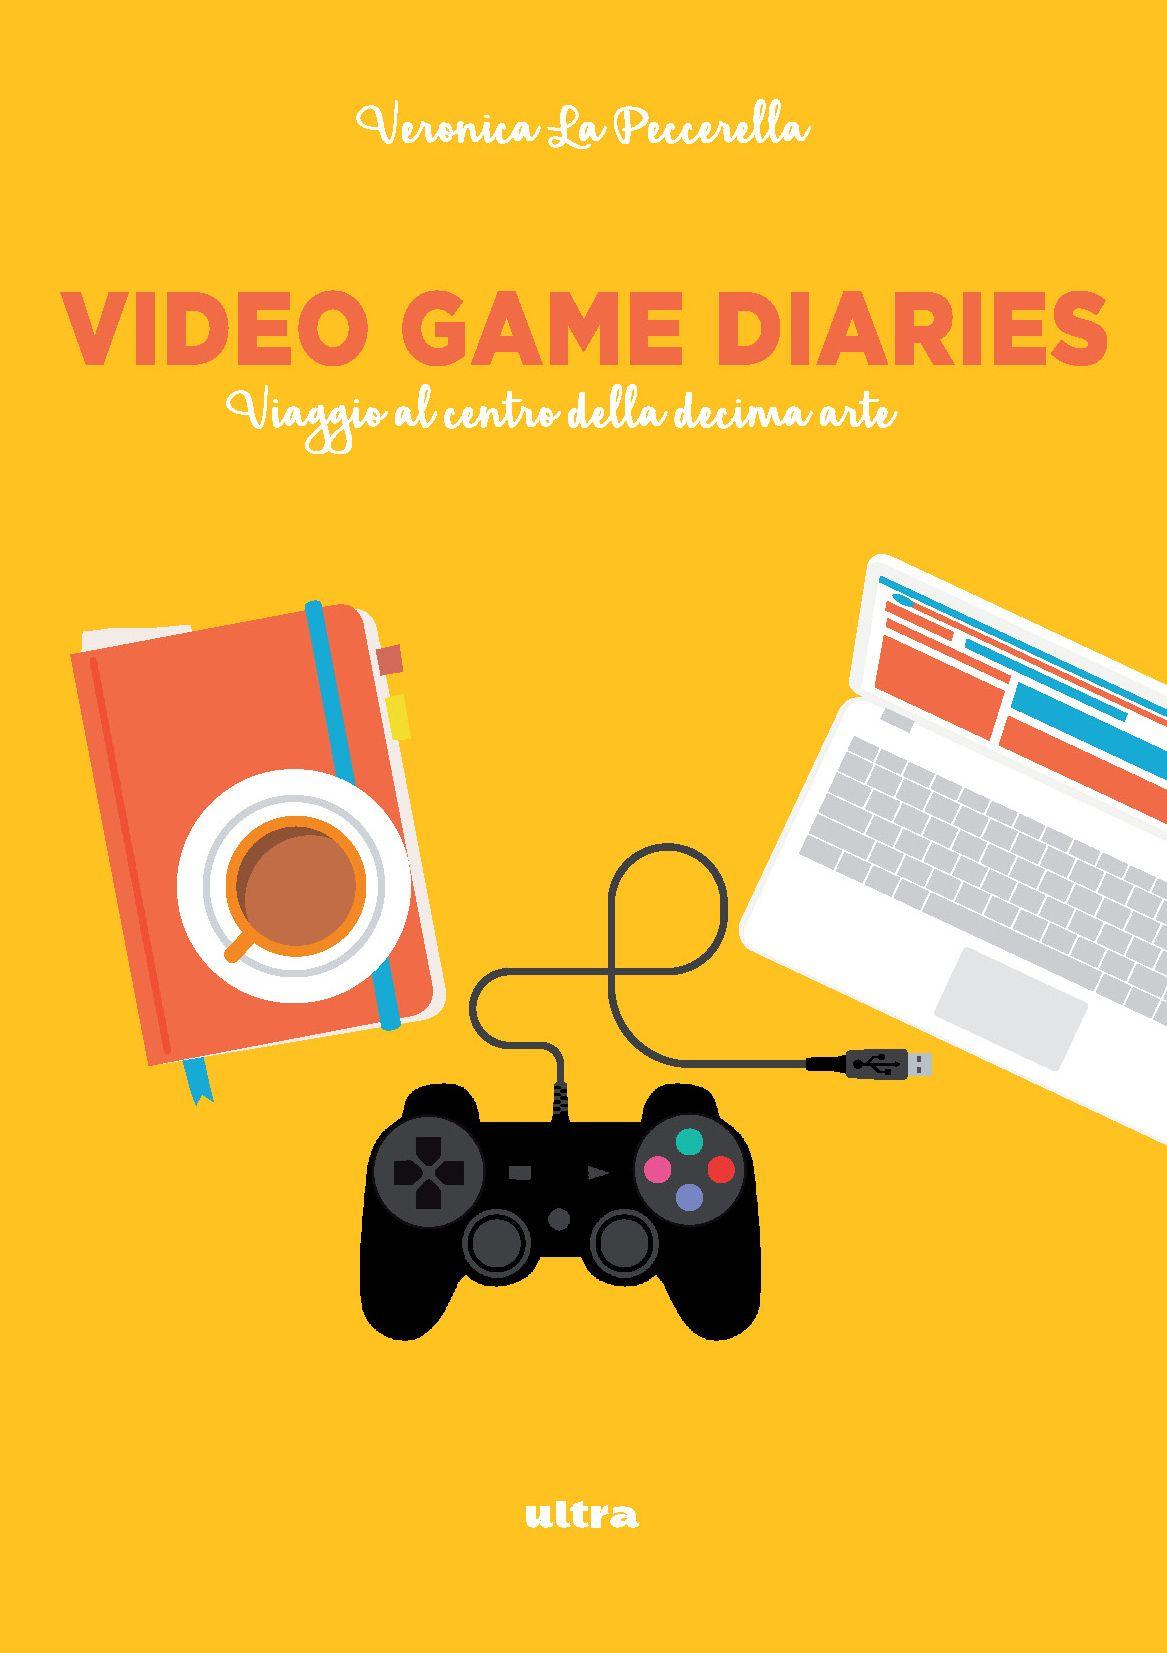 Video game diaries